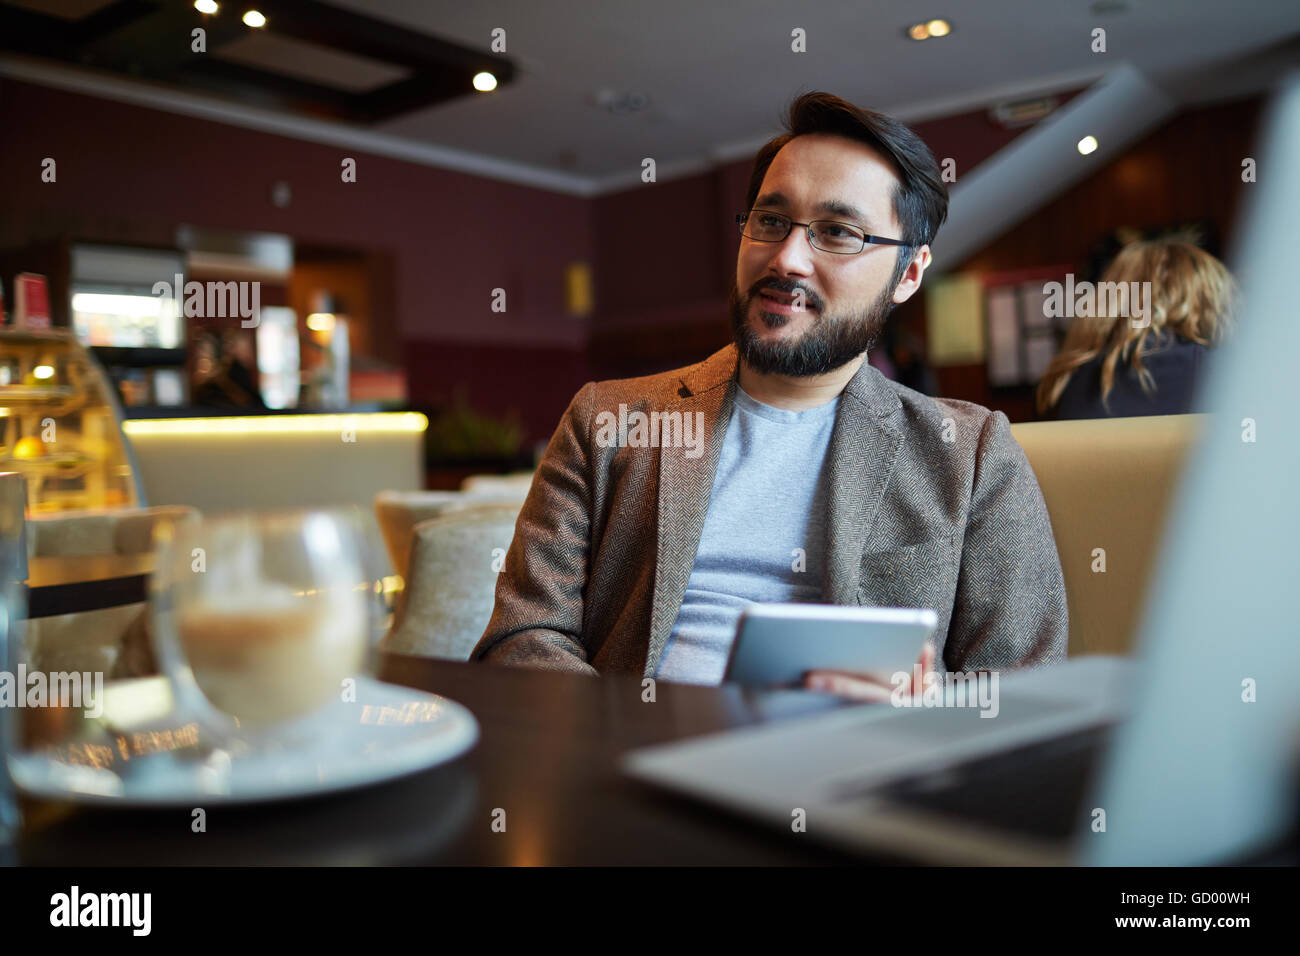 Hombre en el café Imagen De Stock